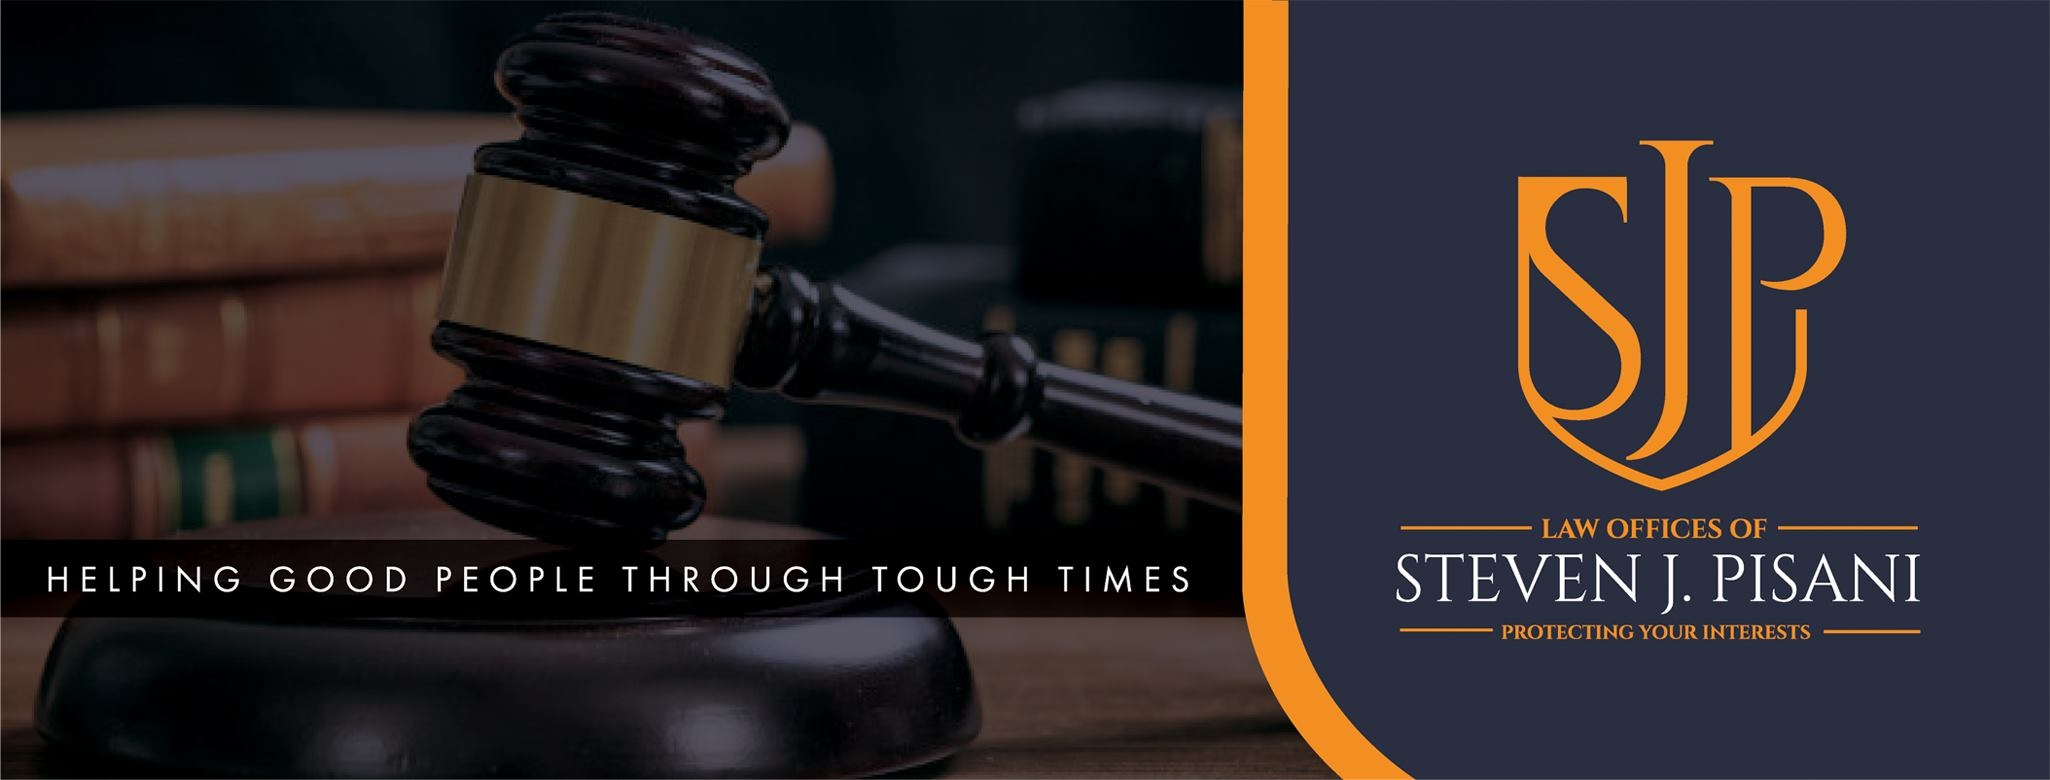 Law Offices of Steven J. Pisani, LLC (@pisanilawfirm) Cover Image